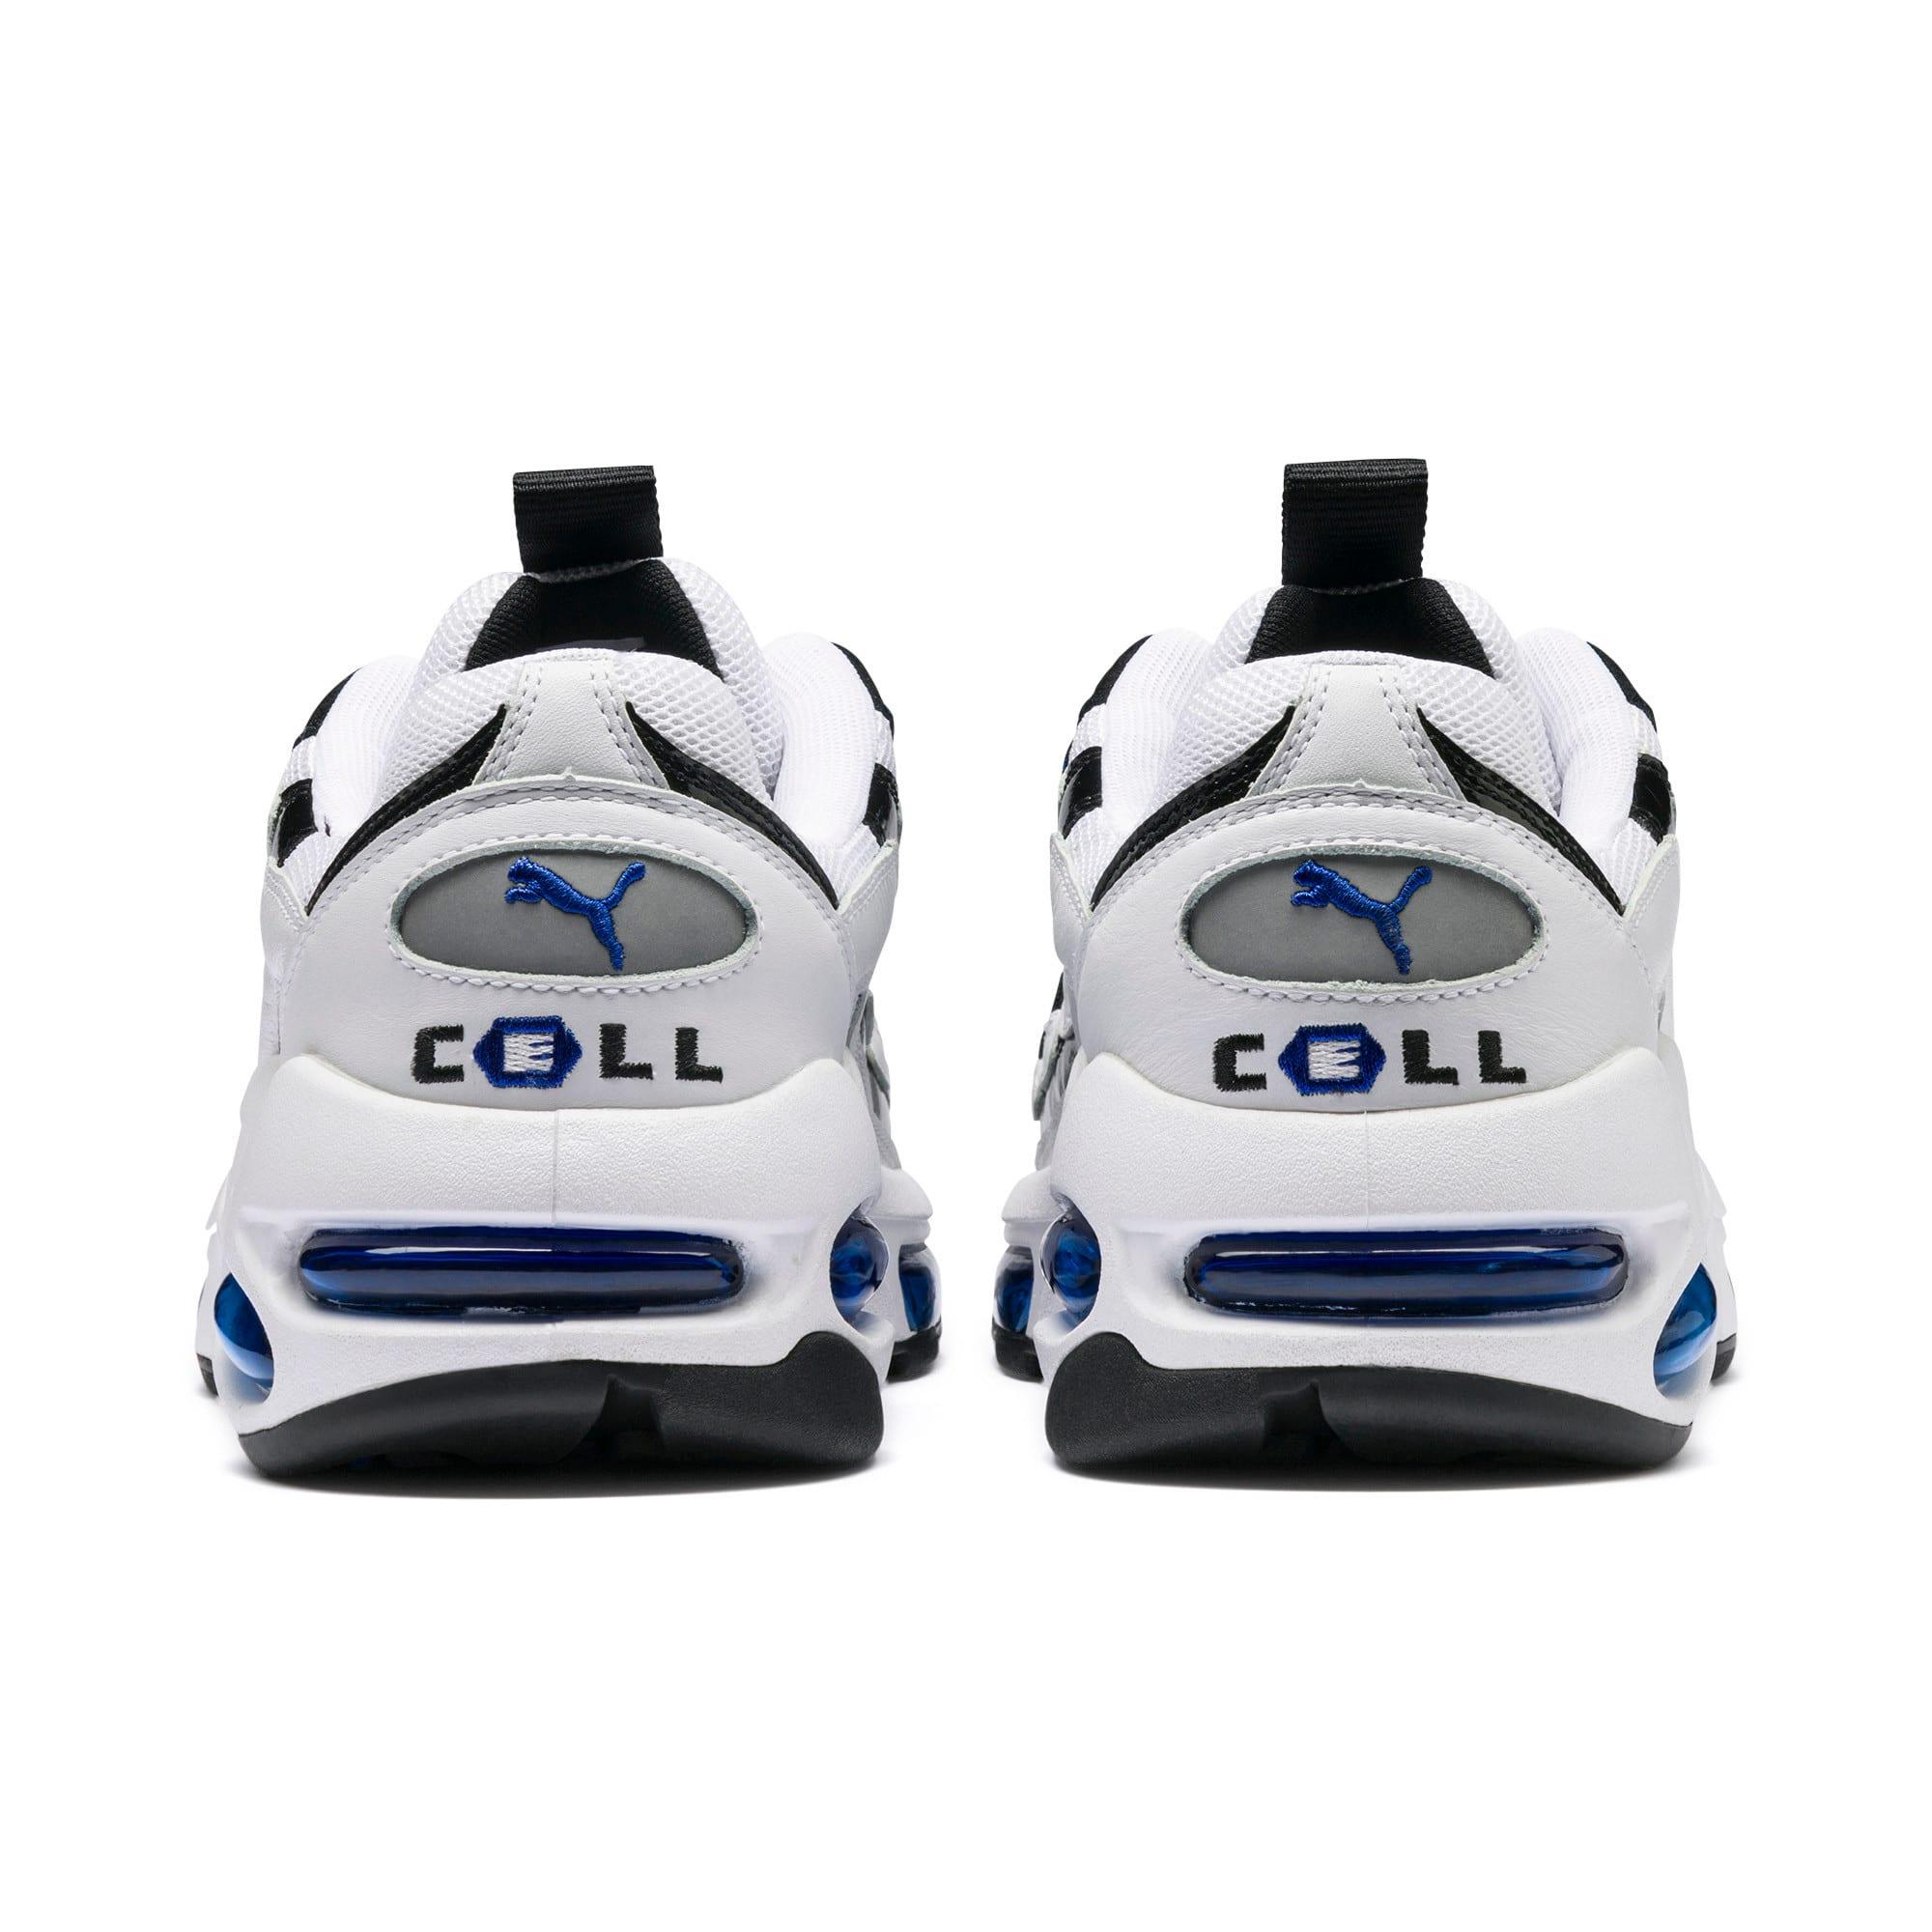 Thumbnail 4 of CELL Endura Patent 98 Men's Sneakers, Puma White-Surf The Web, medium